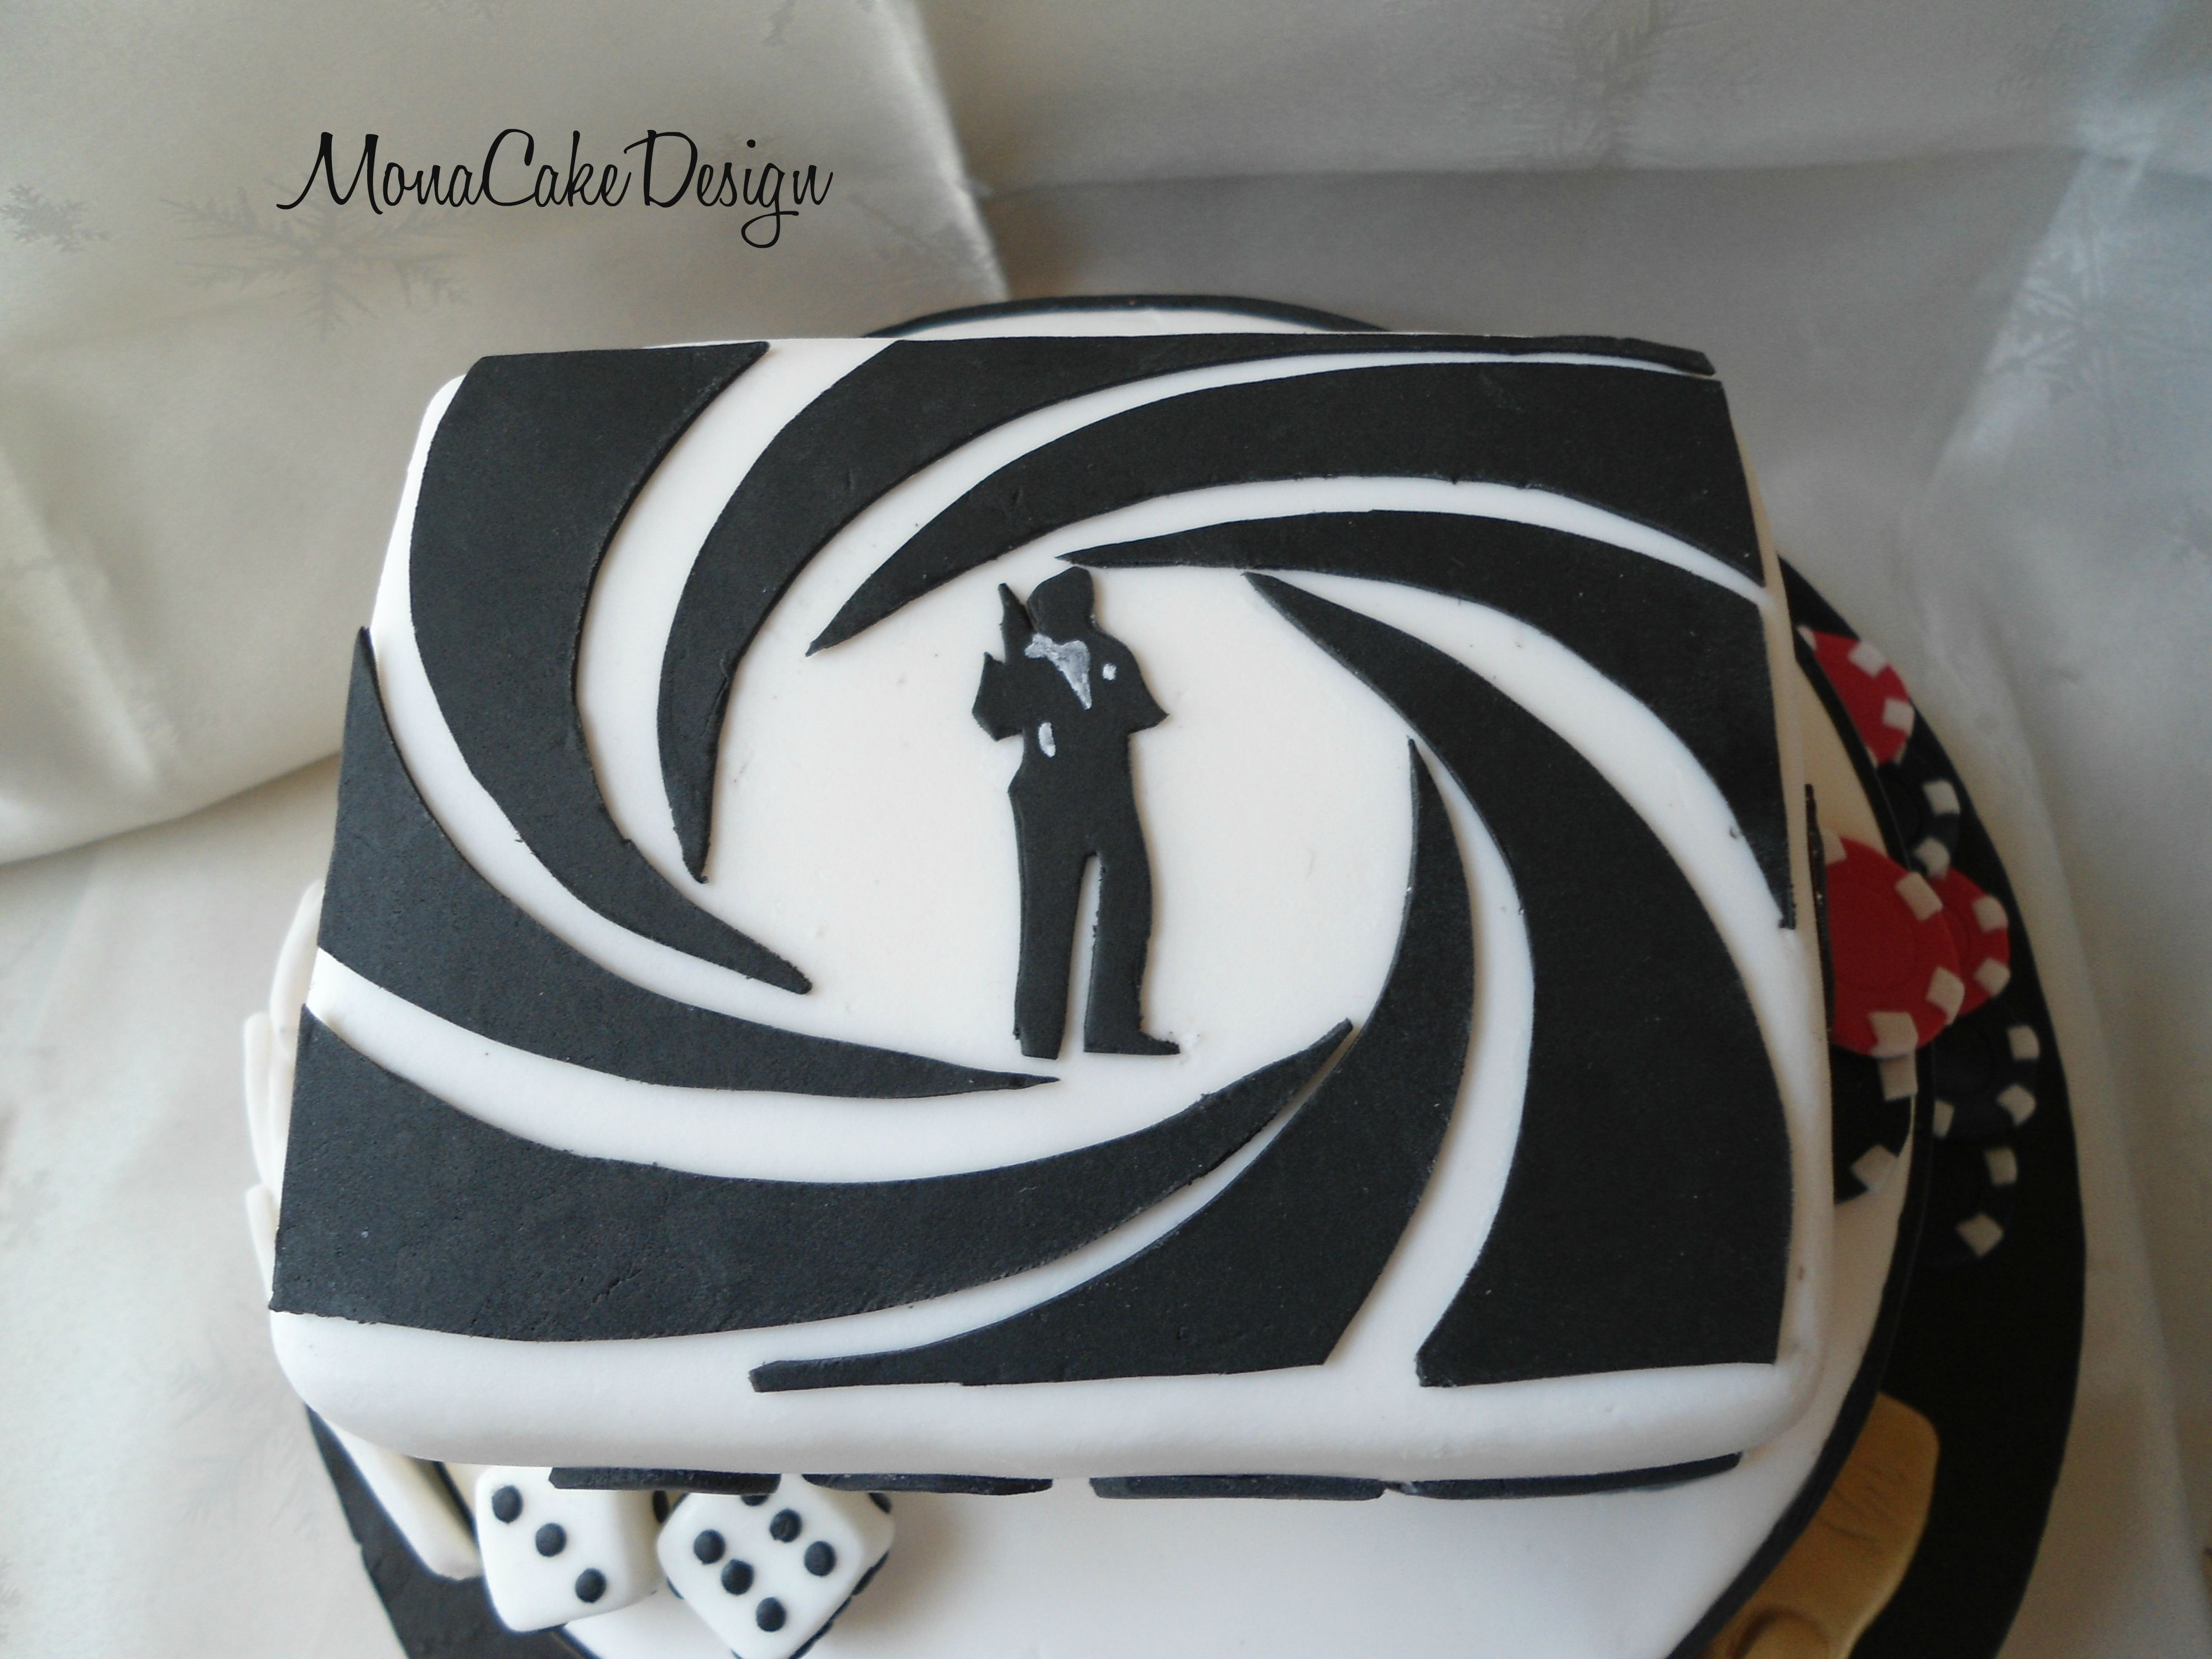 James Bond Cake MonaCakeDesign Pinterest